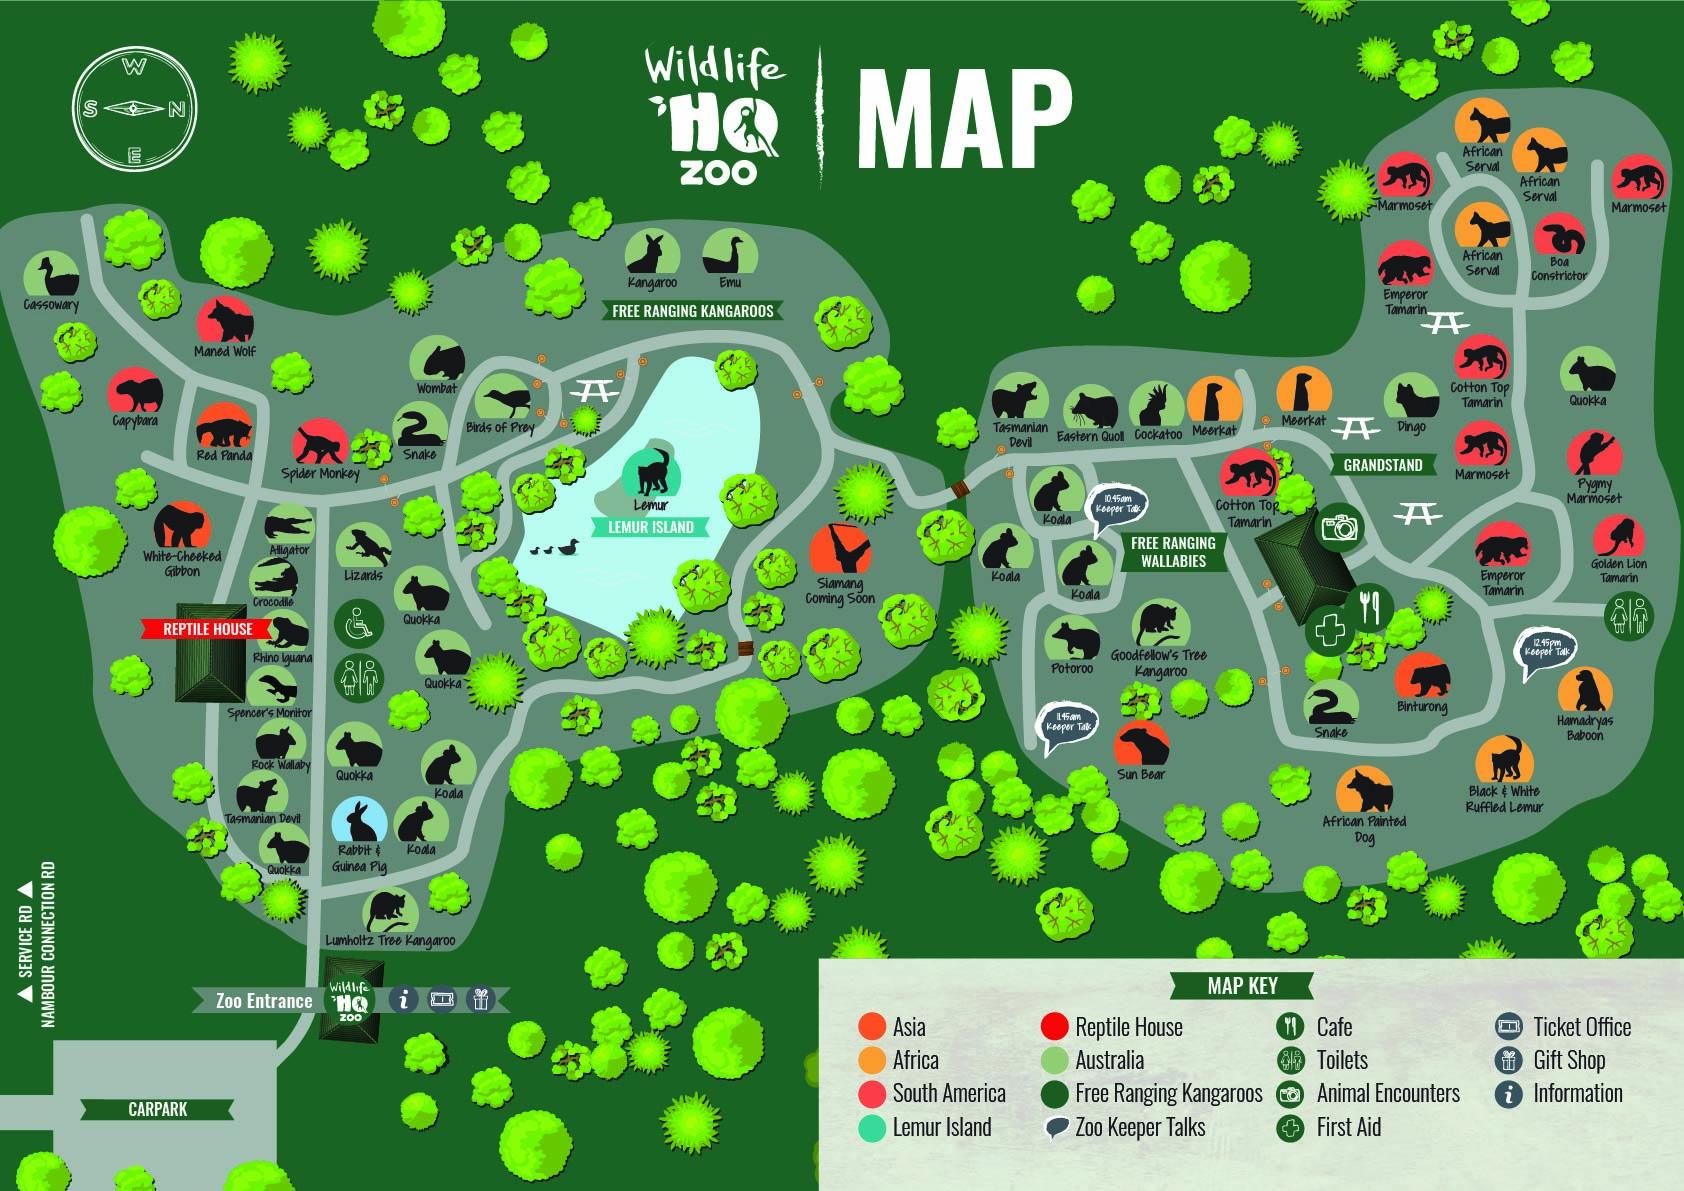 Wildlife HQ Zoo Map